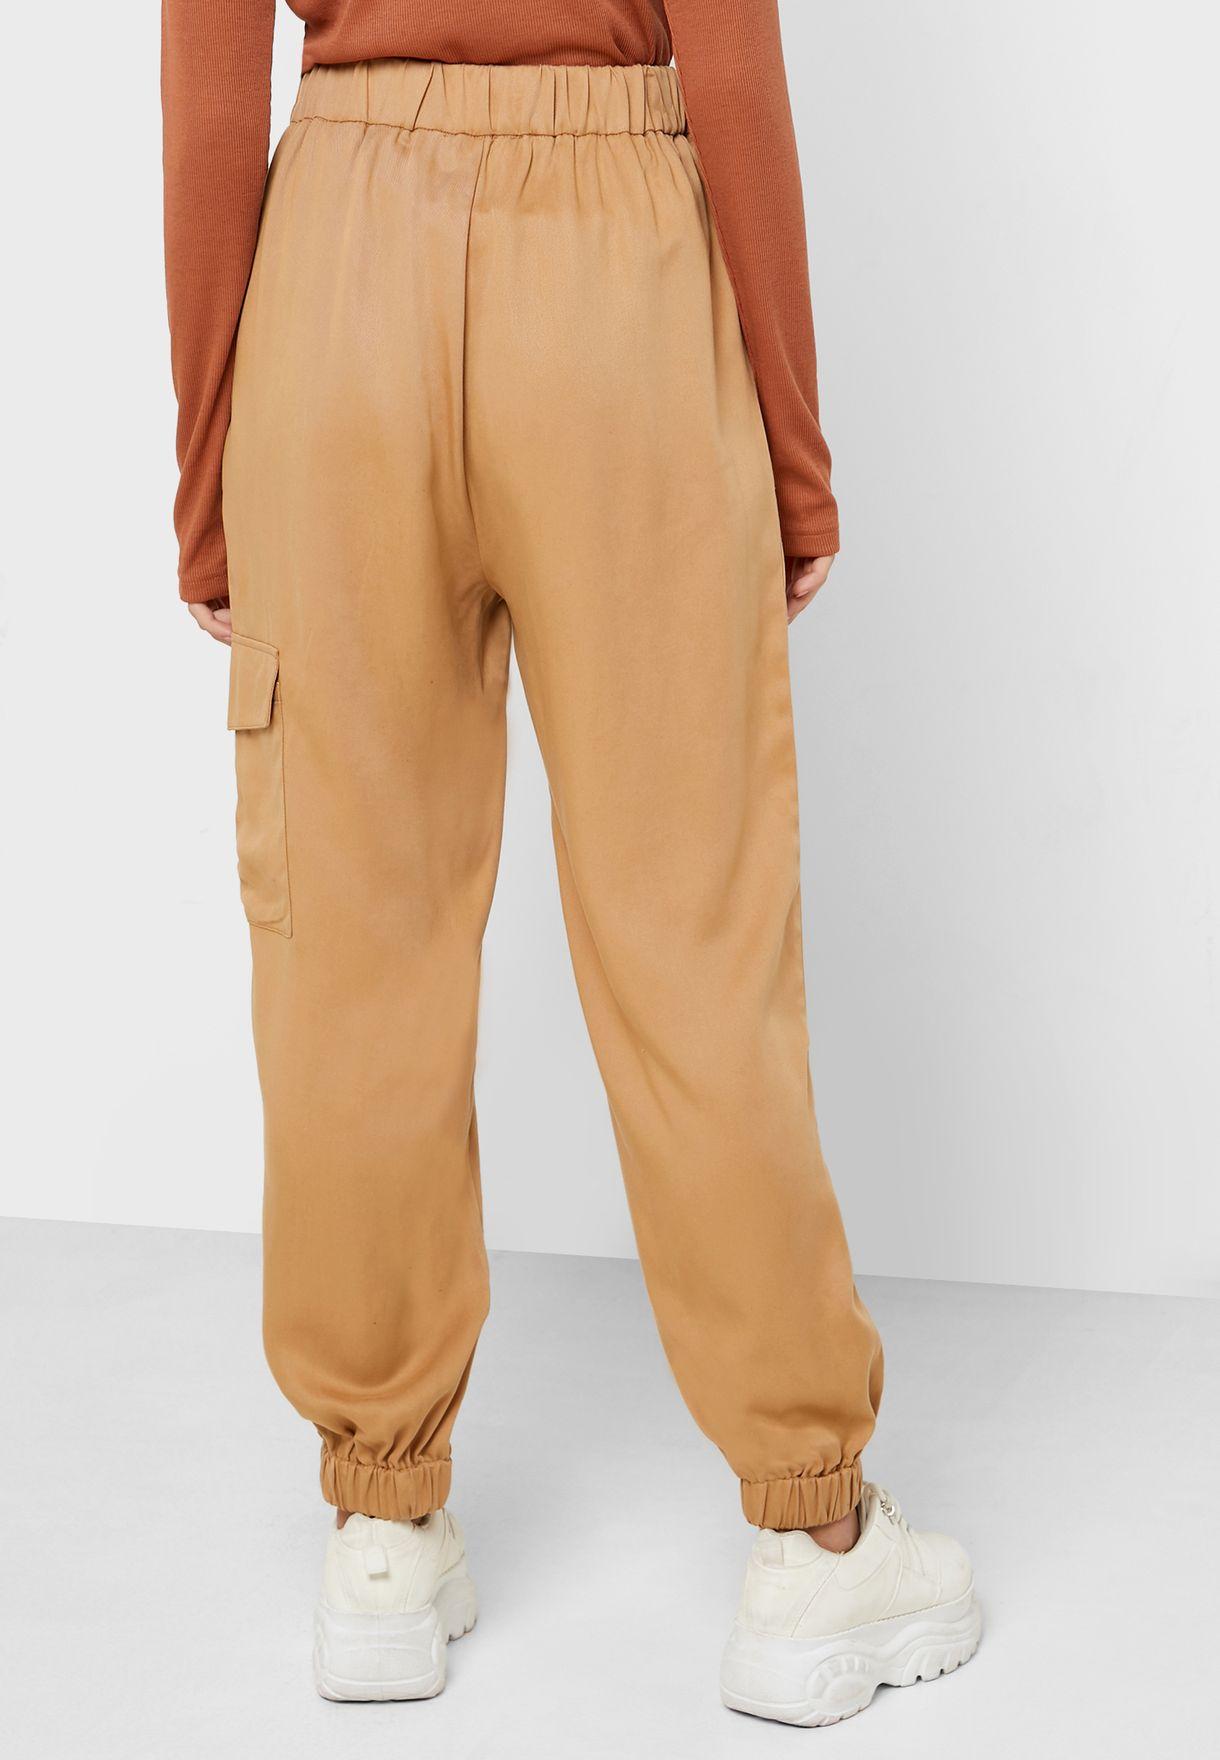 Tencel Cuffed Cargo Pants